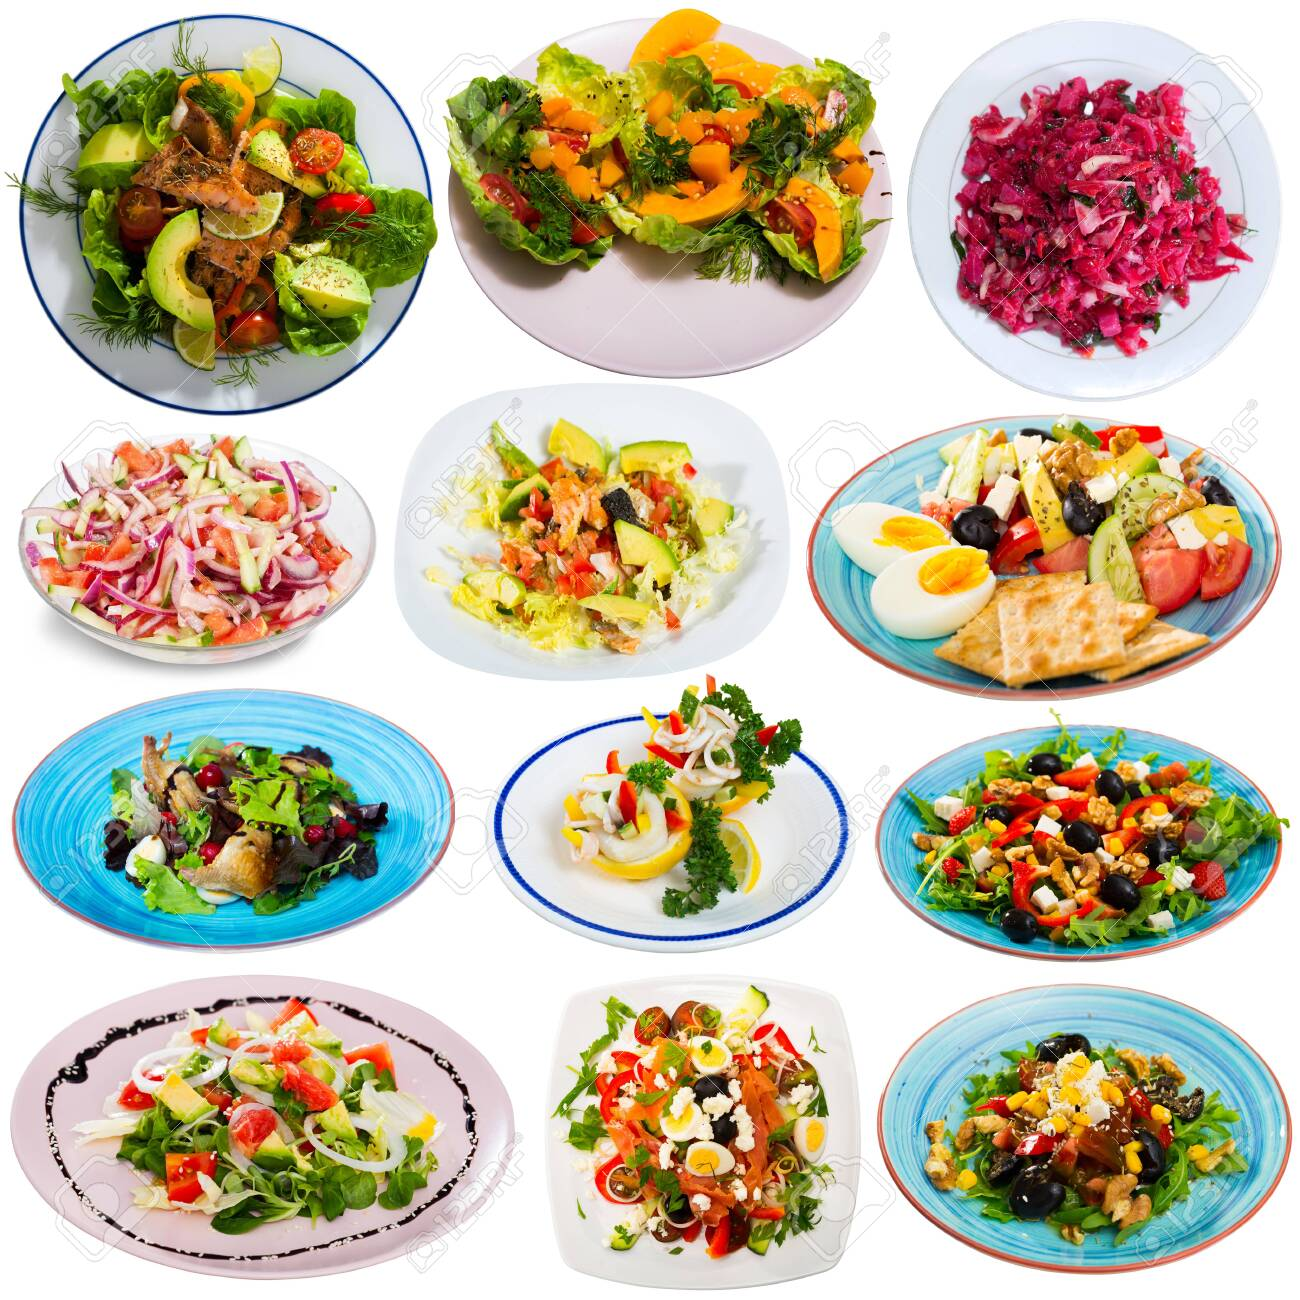 Set of various salads isolated on white background - 134555154